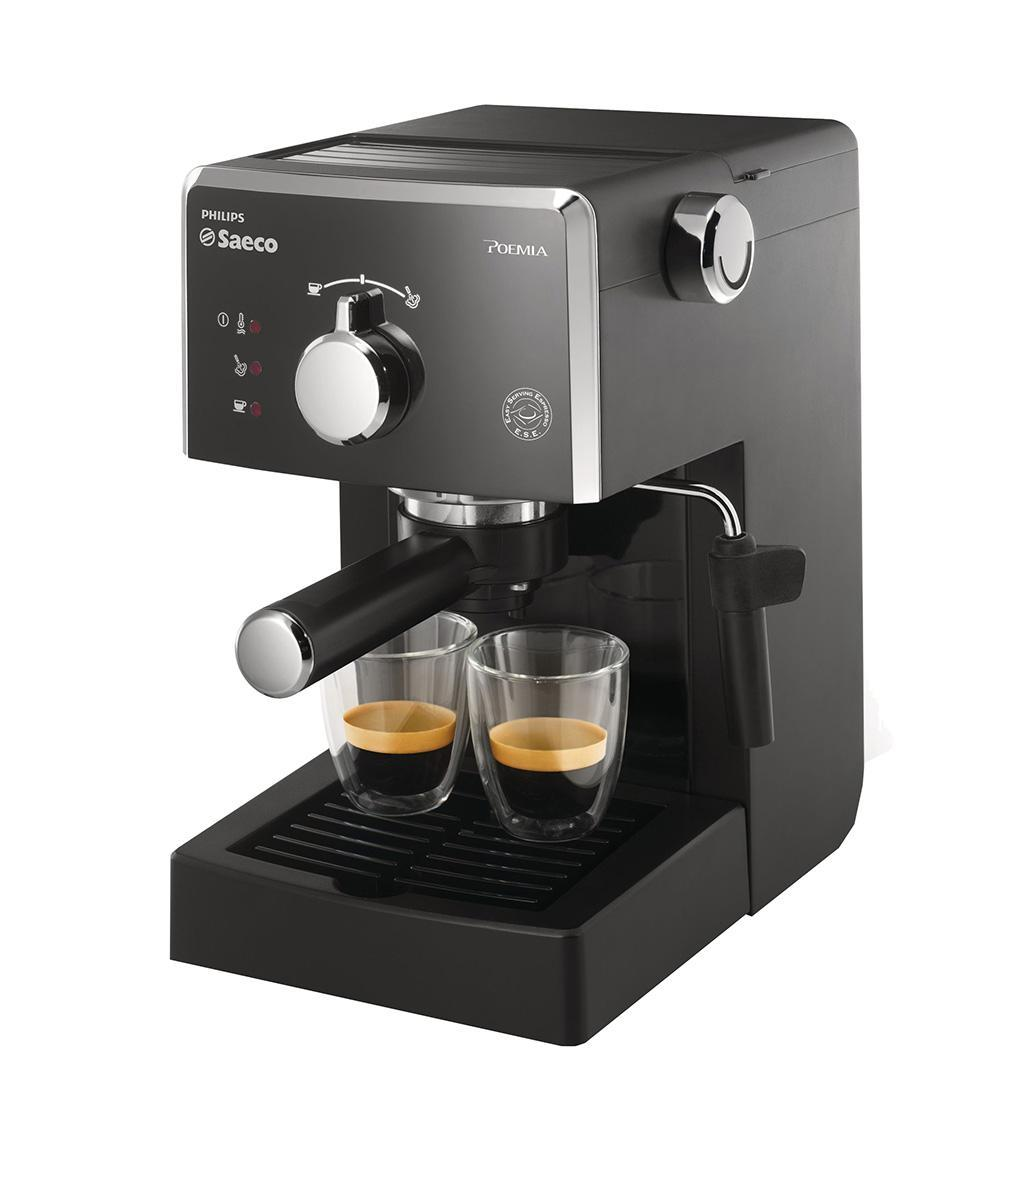 Philips Saeco HD8323/39 рожковая кофеварка